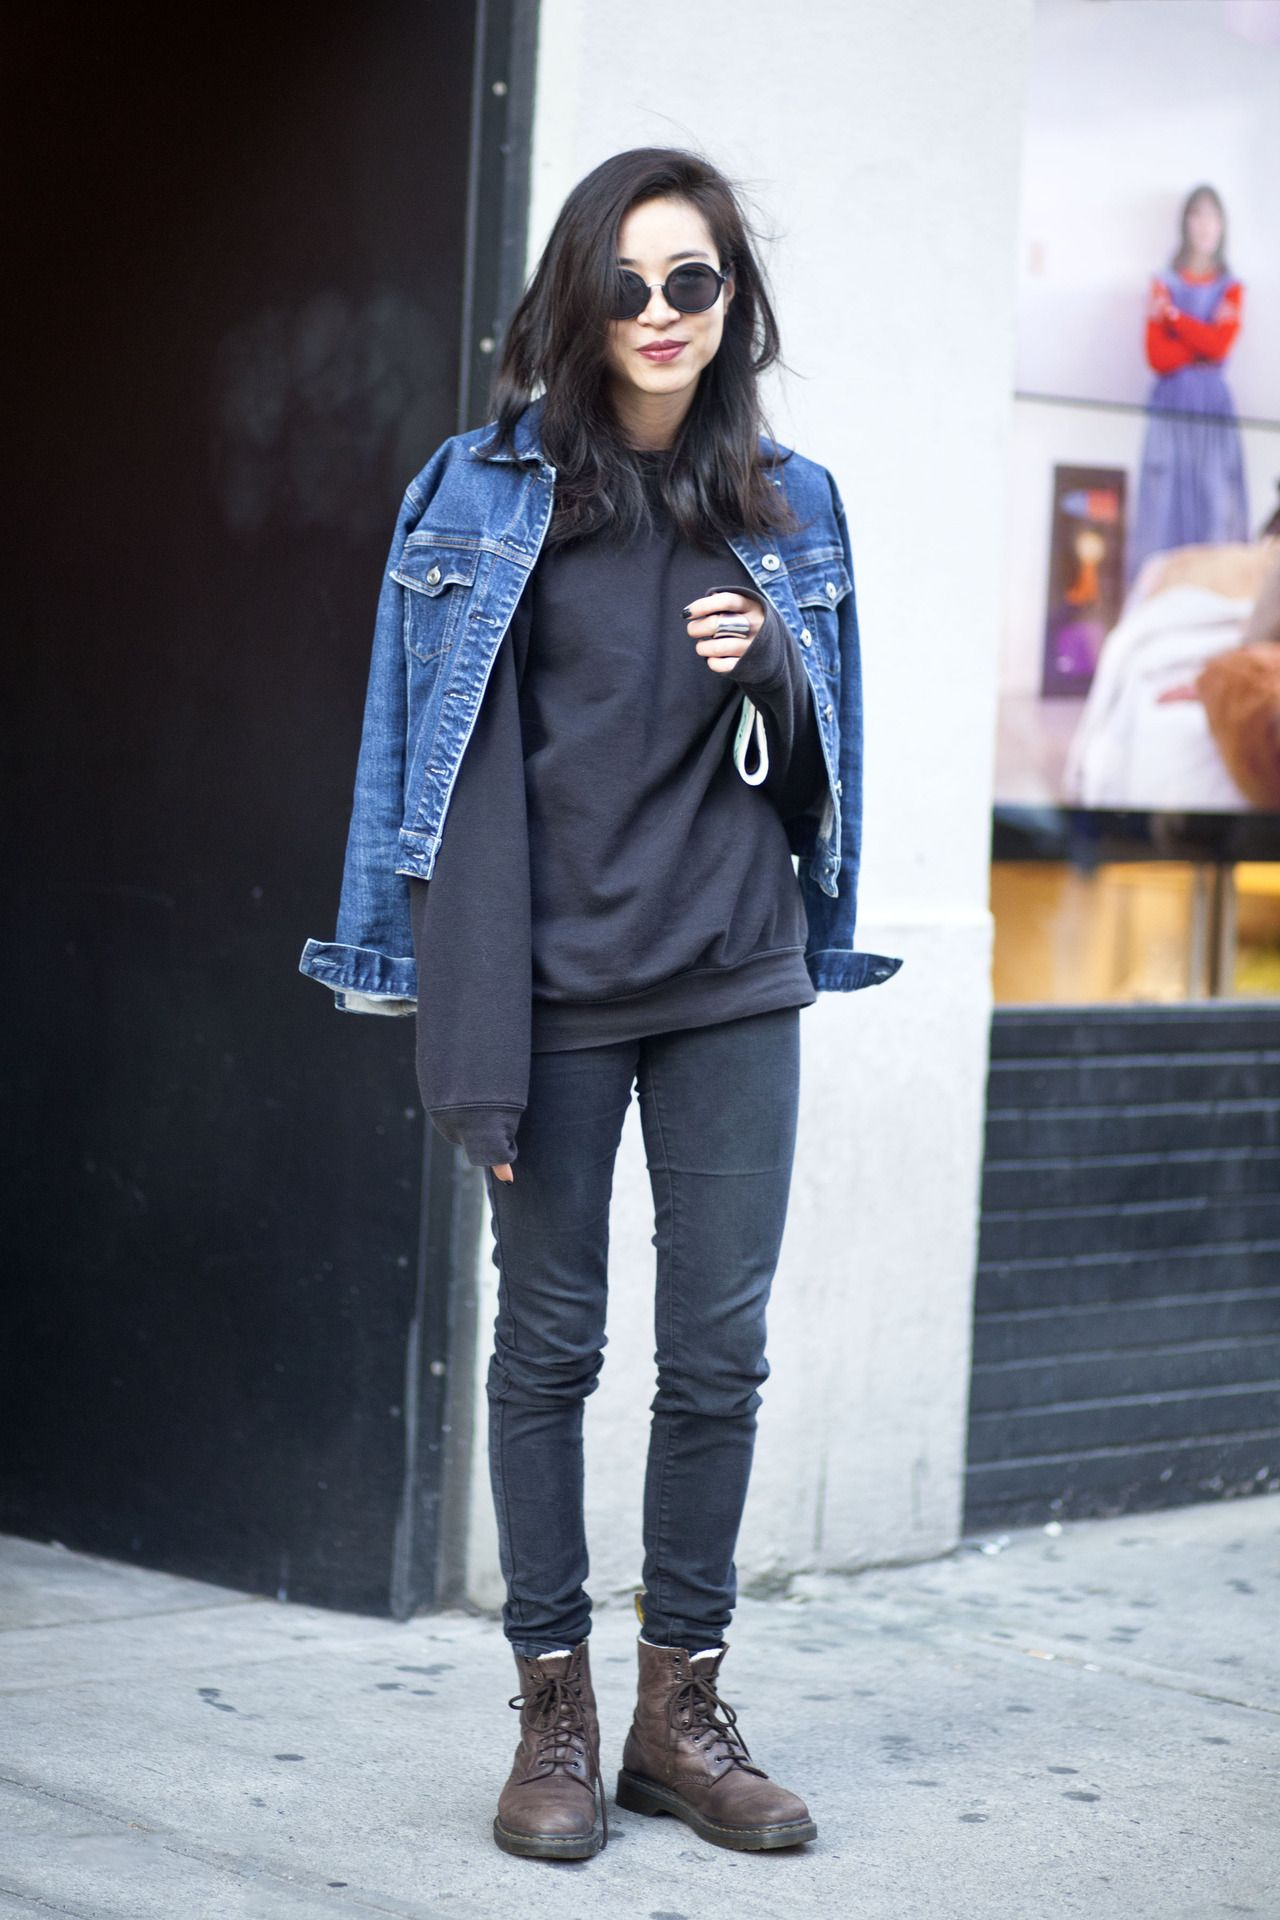 Qweary Female Stud Skater Style Black Denim Denim